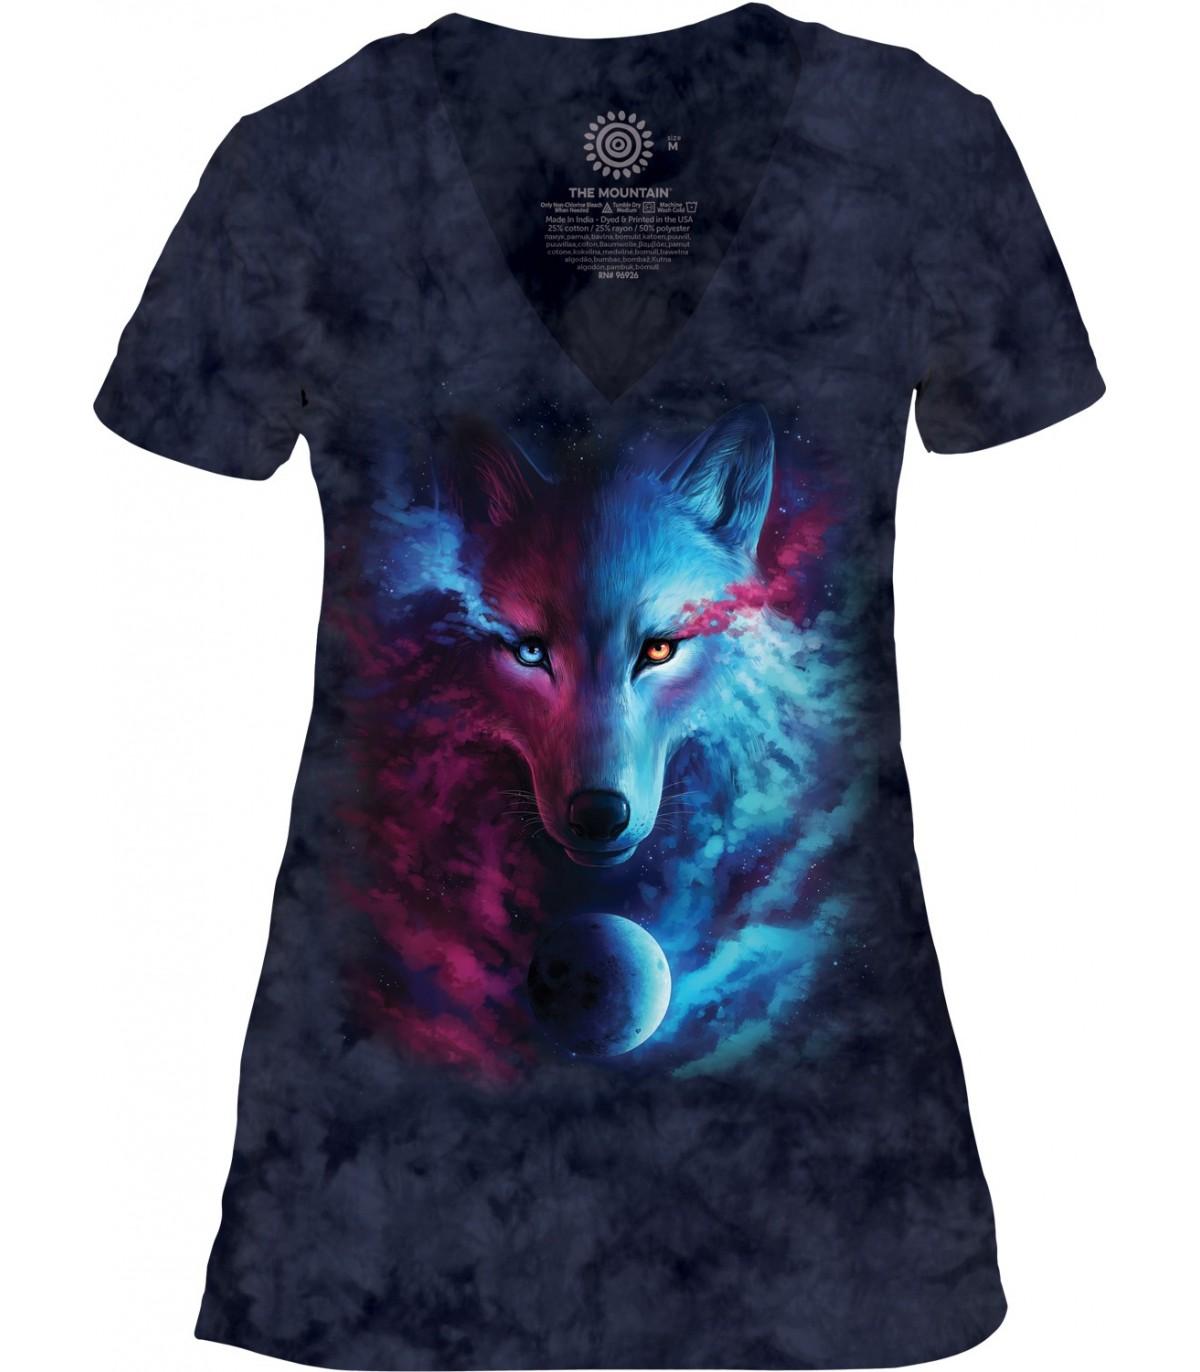 cbc90adf740 Tee-shirt femme motif loup avec col en V - The Mountain